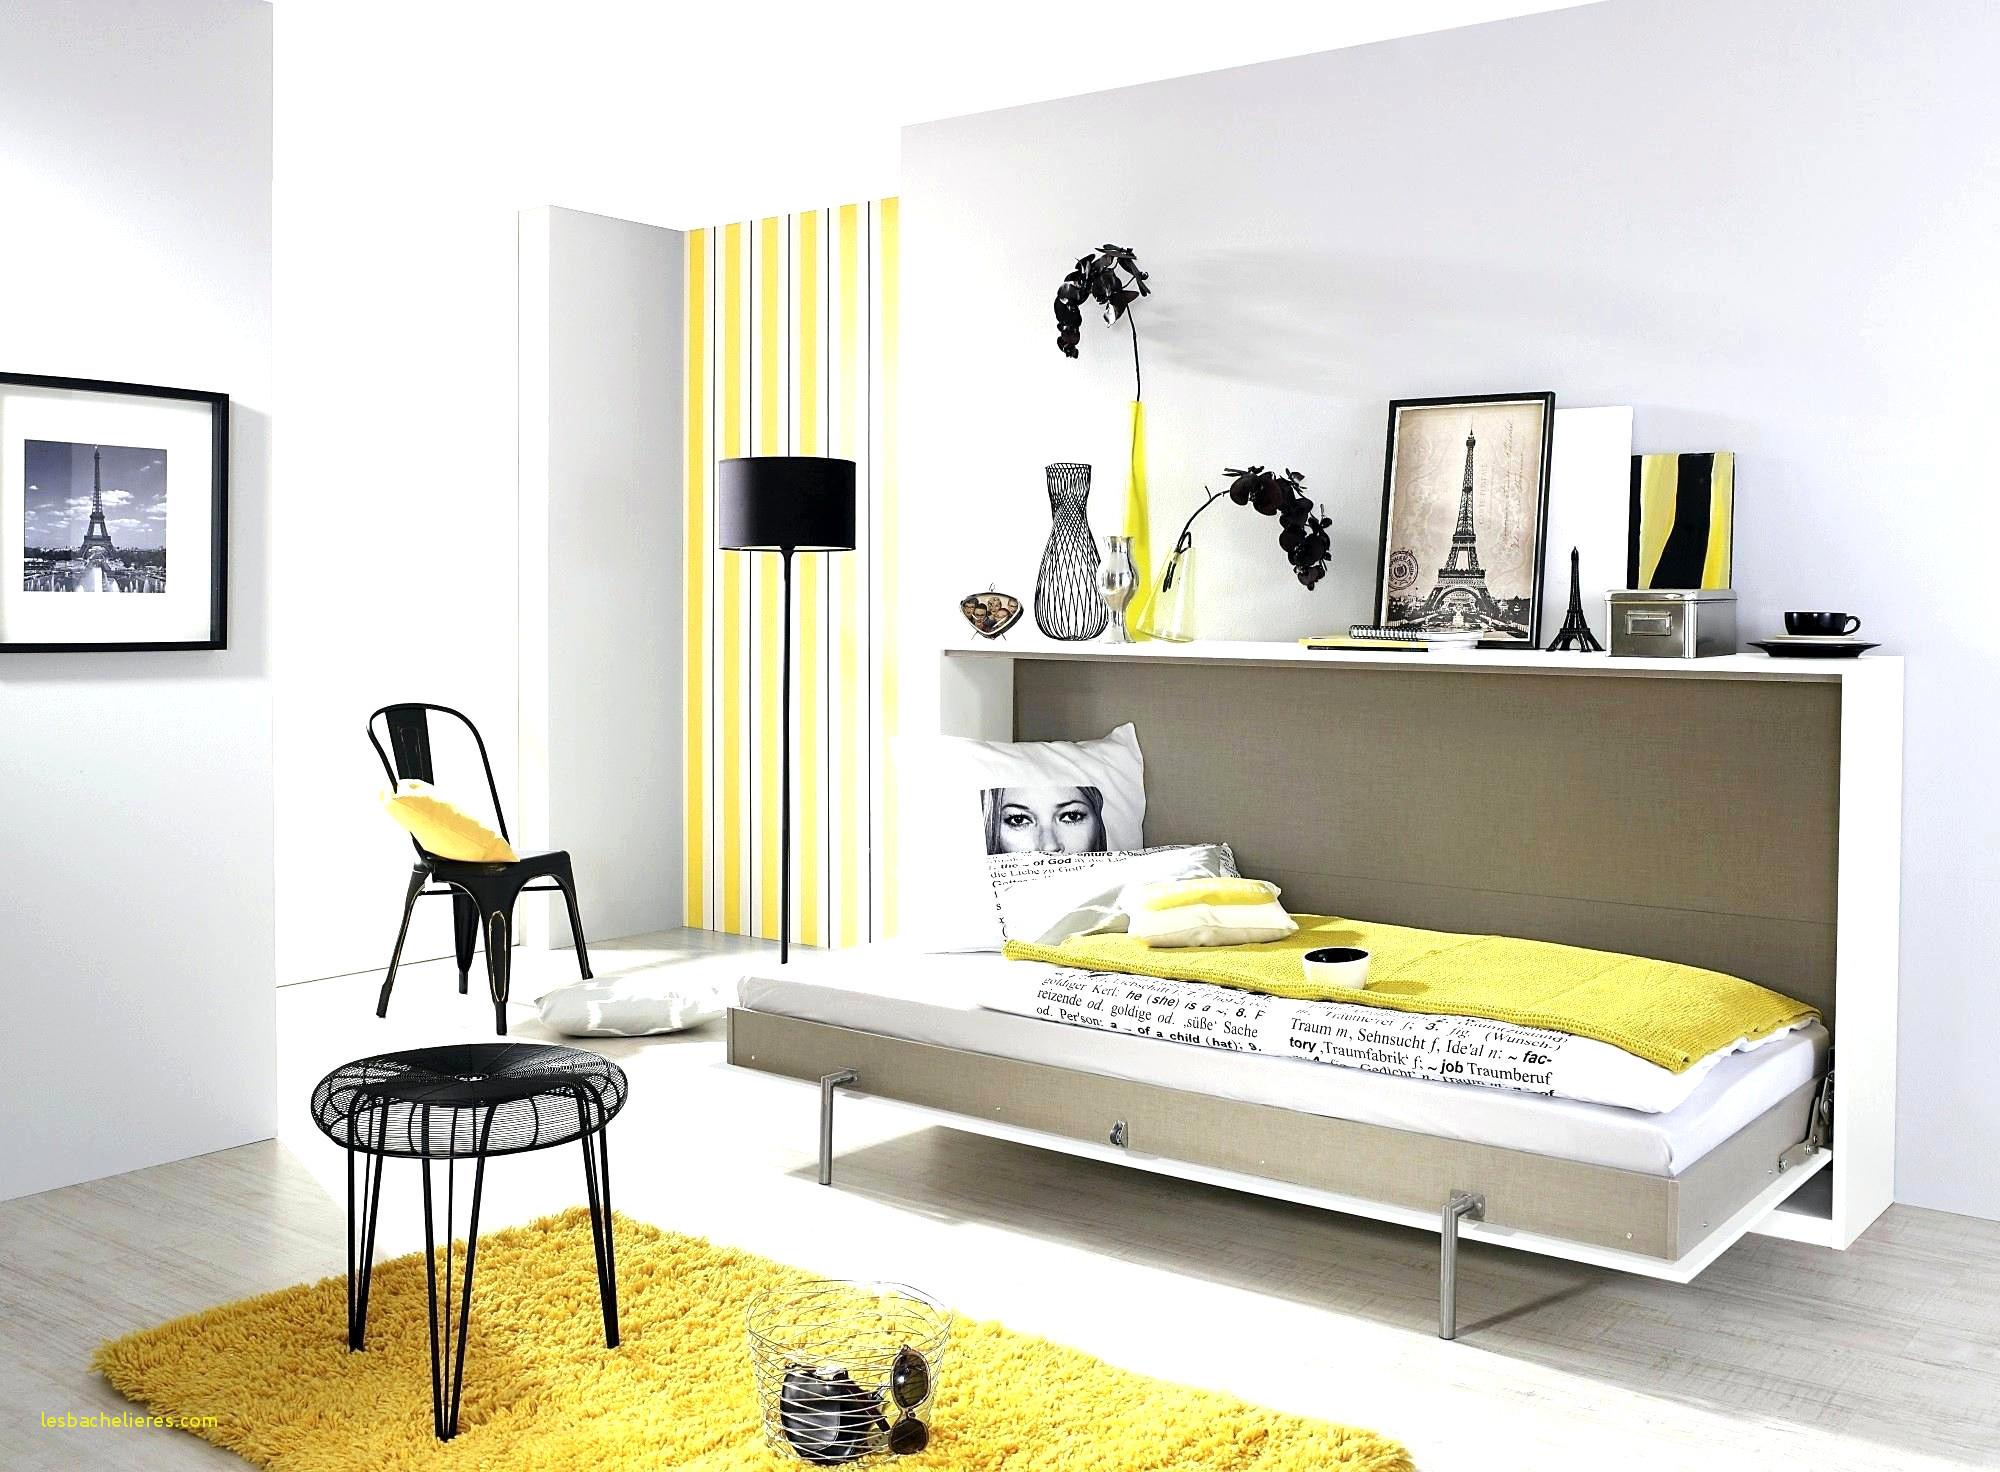 meuble but chambre 34 modc2a8le meuble but chambre of meuble but chambre